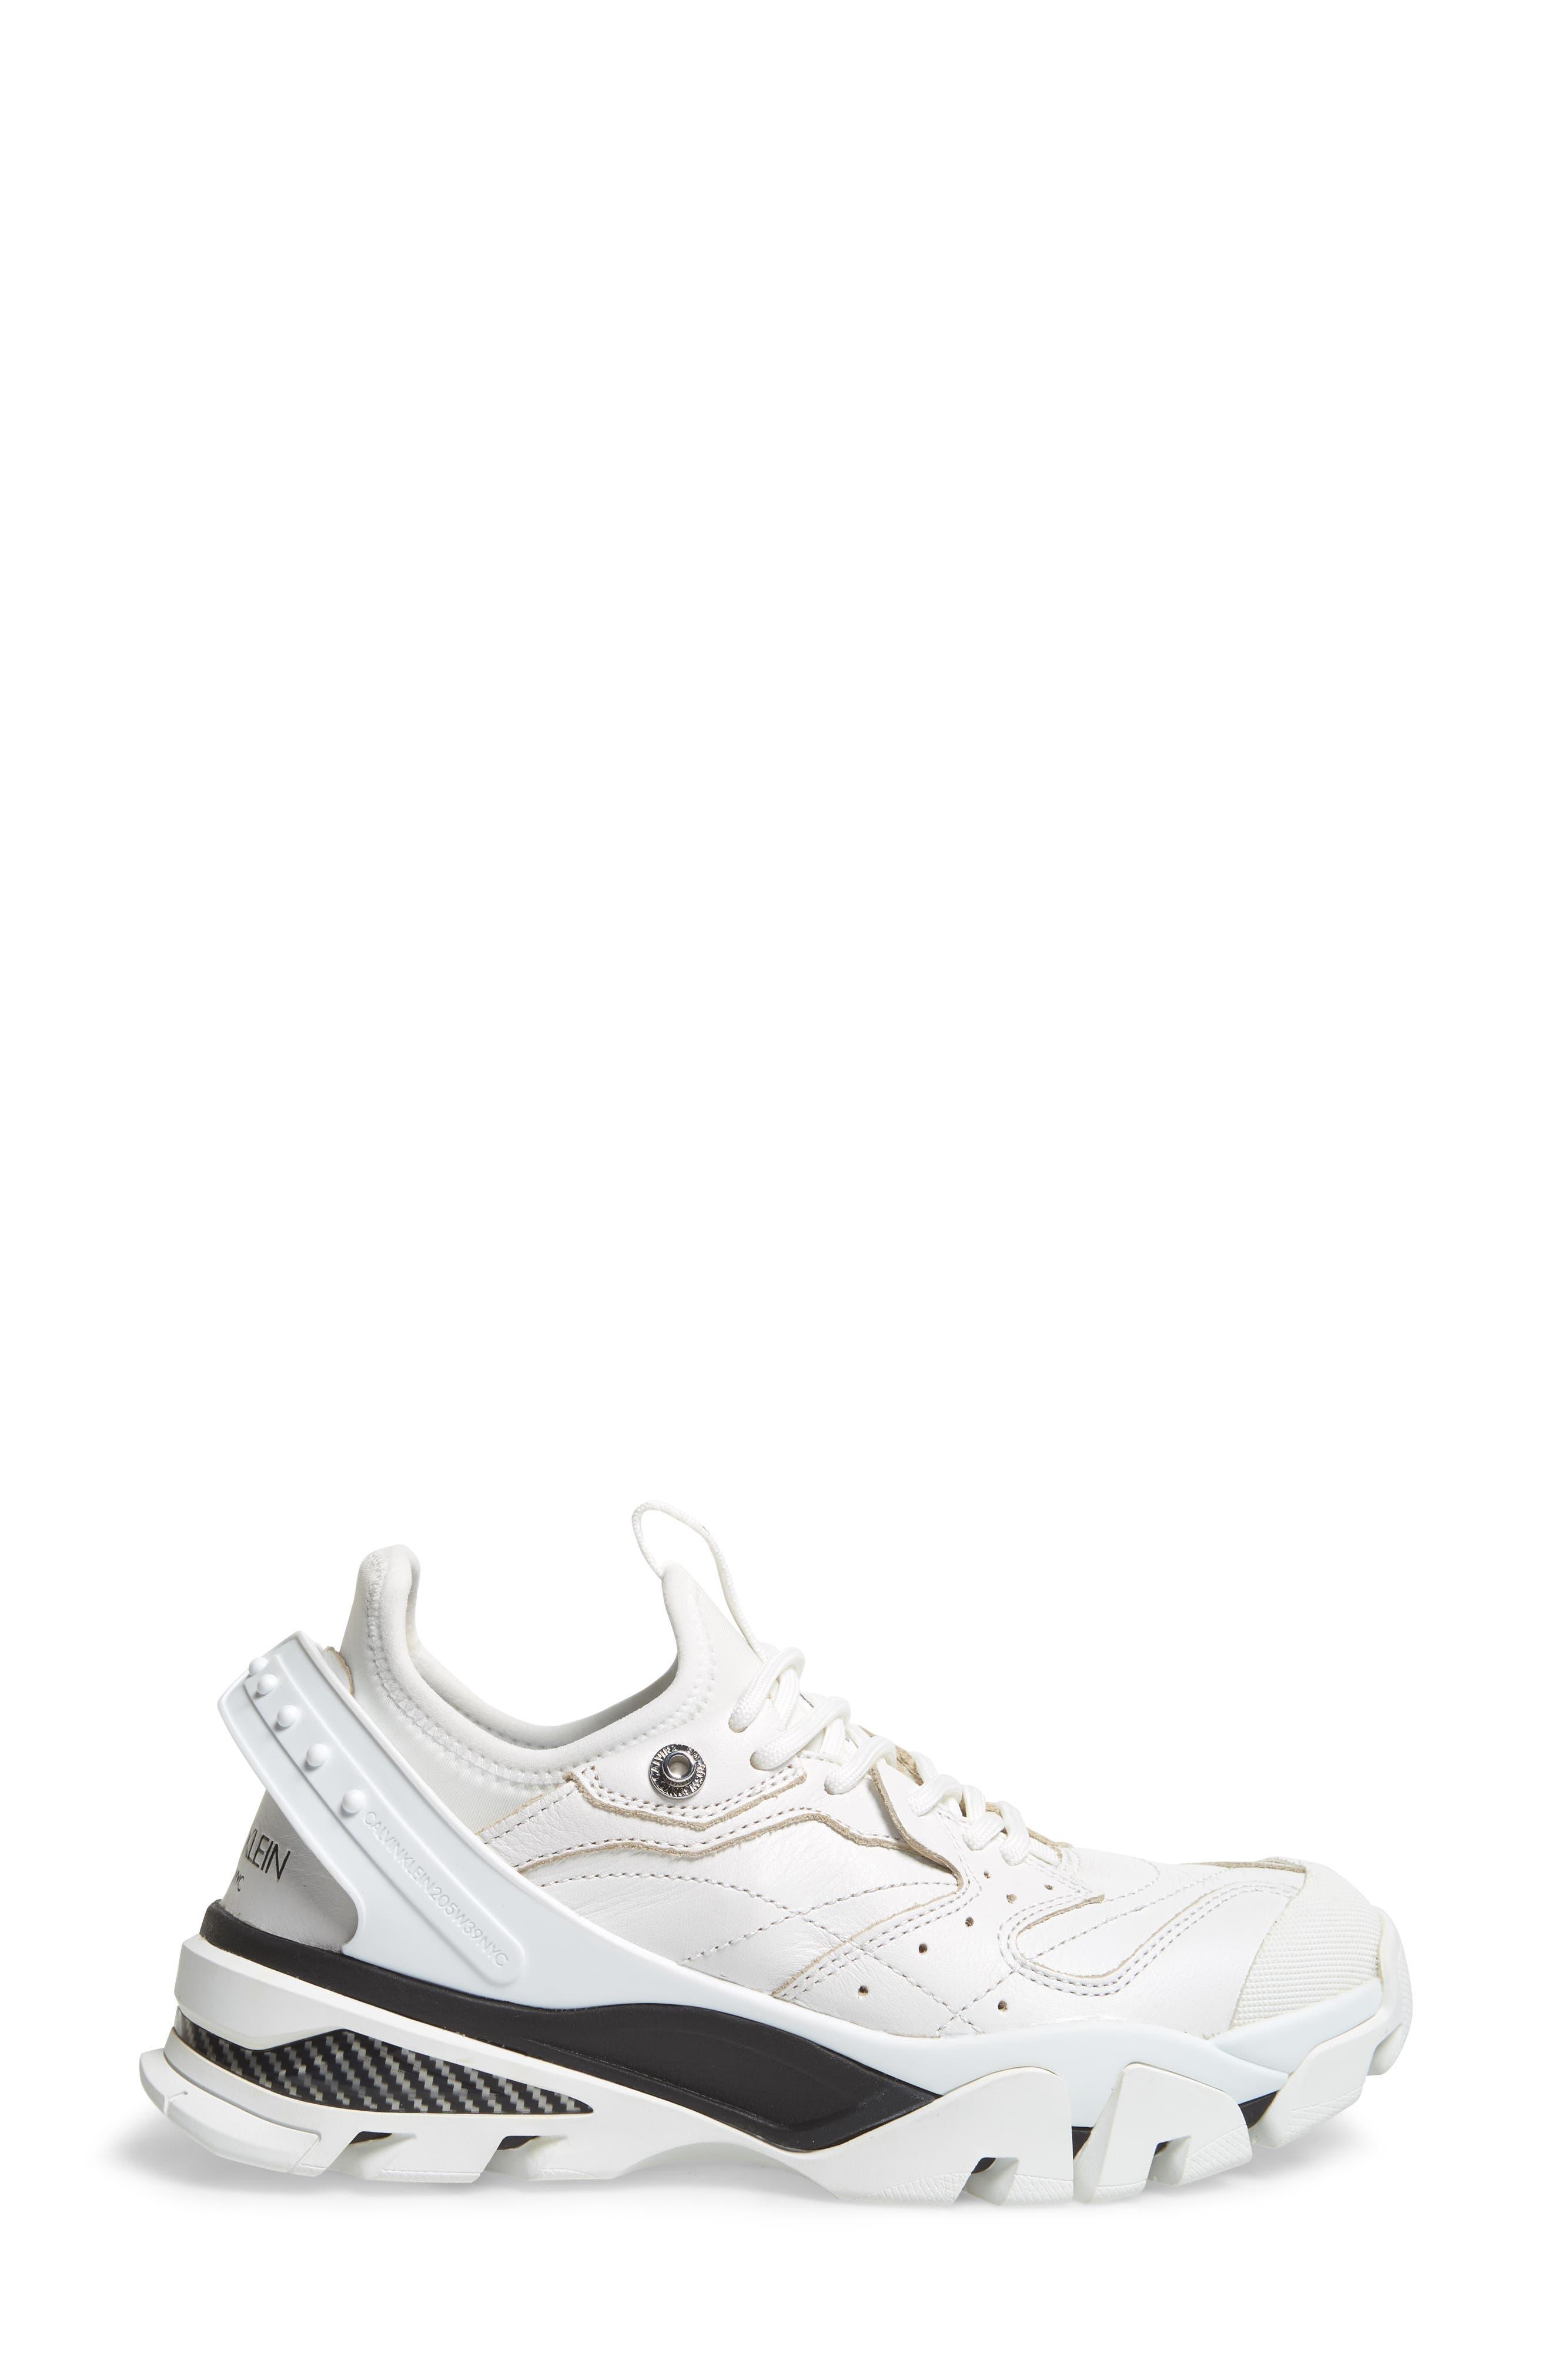 CALVIN KLEIN, 205W39NYC Carla Sneaker, Alternate thumbnail 3, color, WHITE/ BLACK/ BLACK